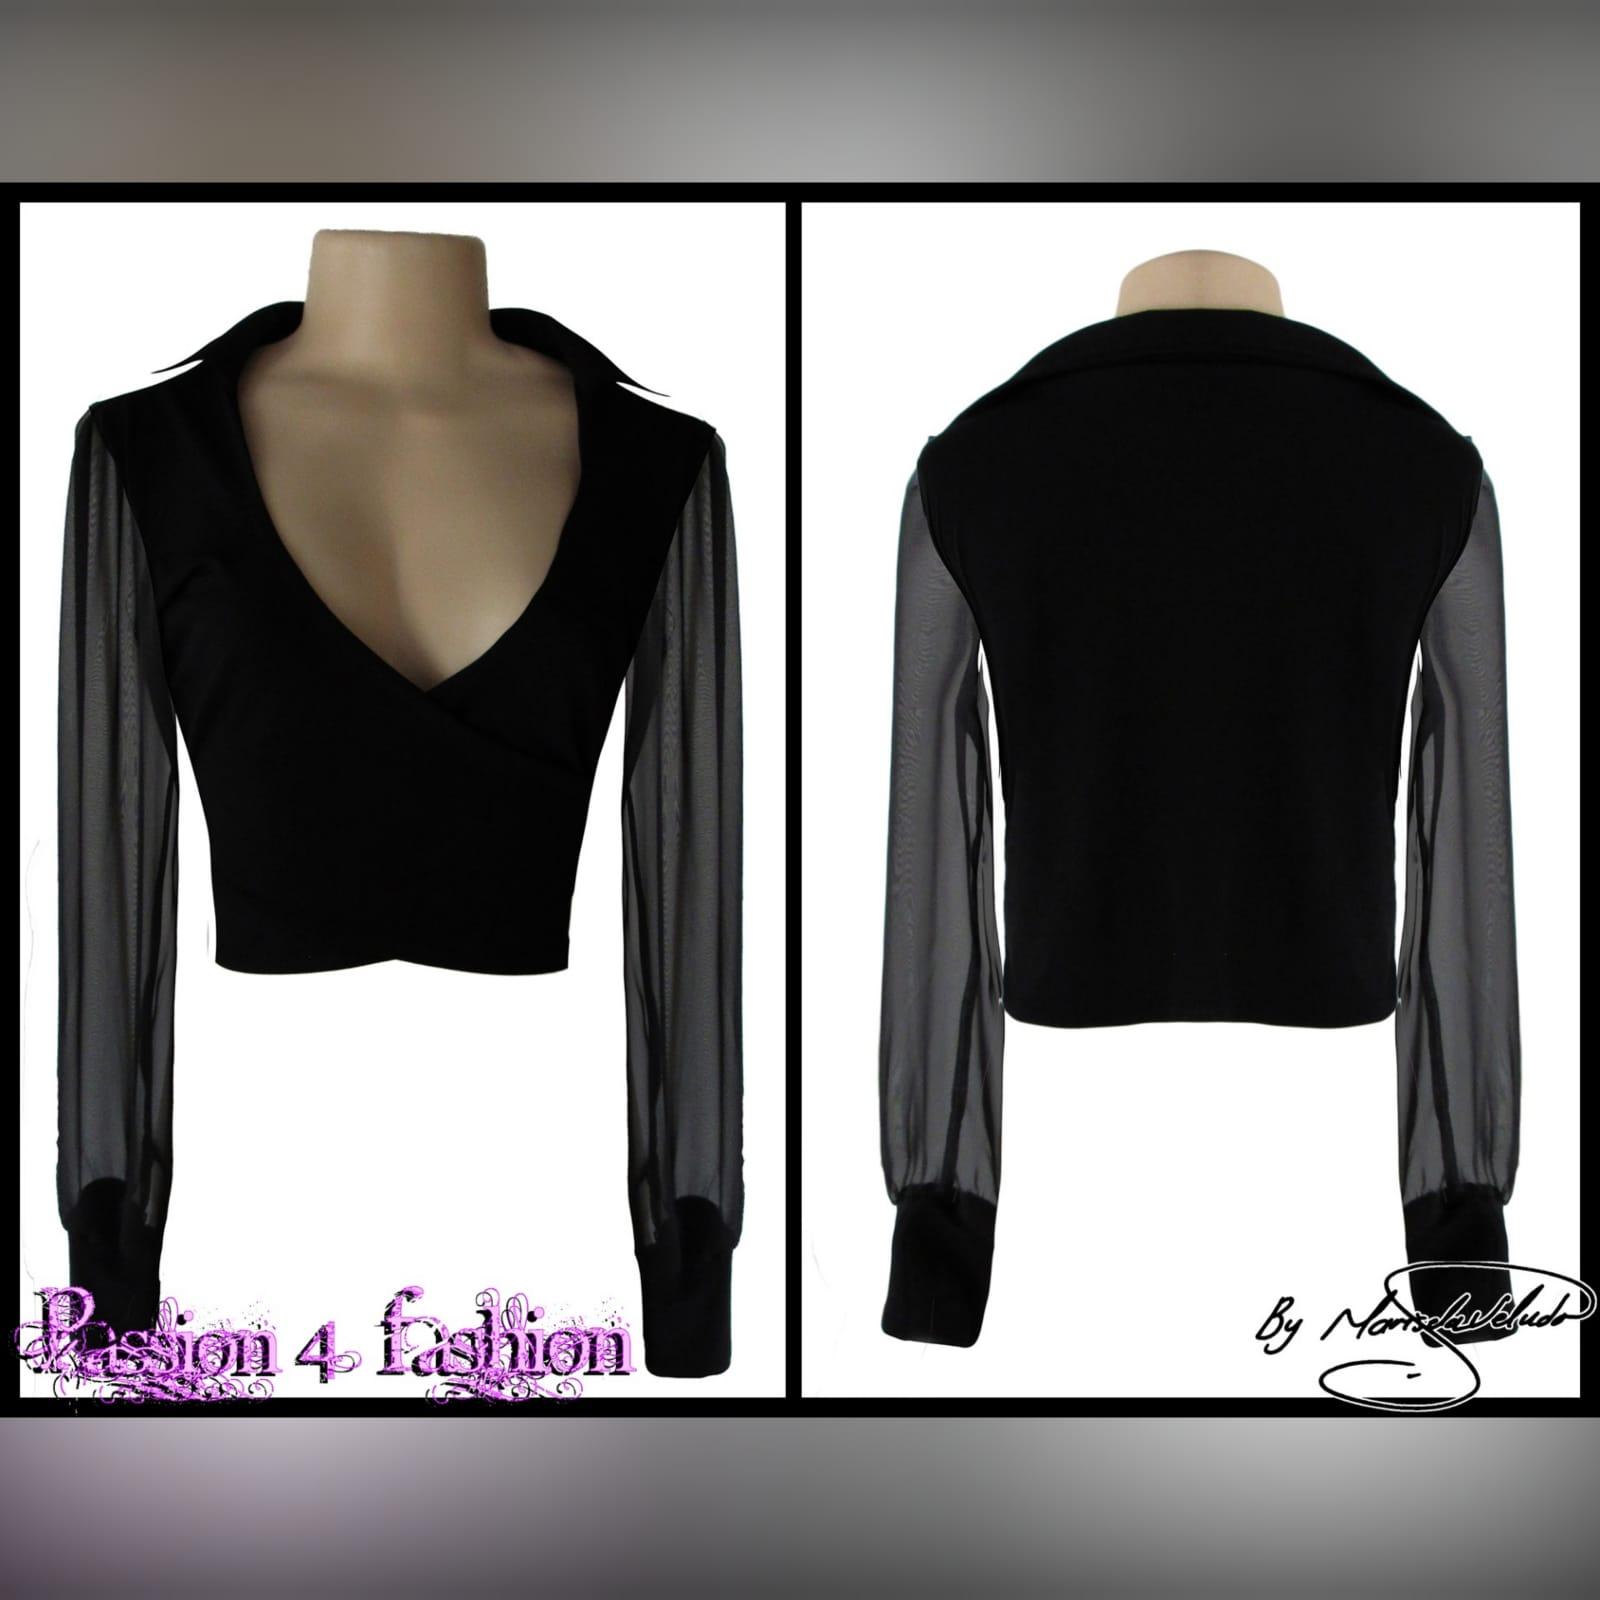 Smart casual v neck black crop top 2 smart casual v neck, black crop top with a back collar, sheer long sleeves. Black cuff